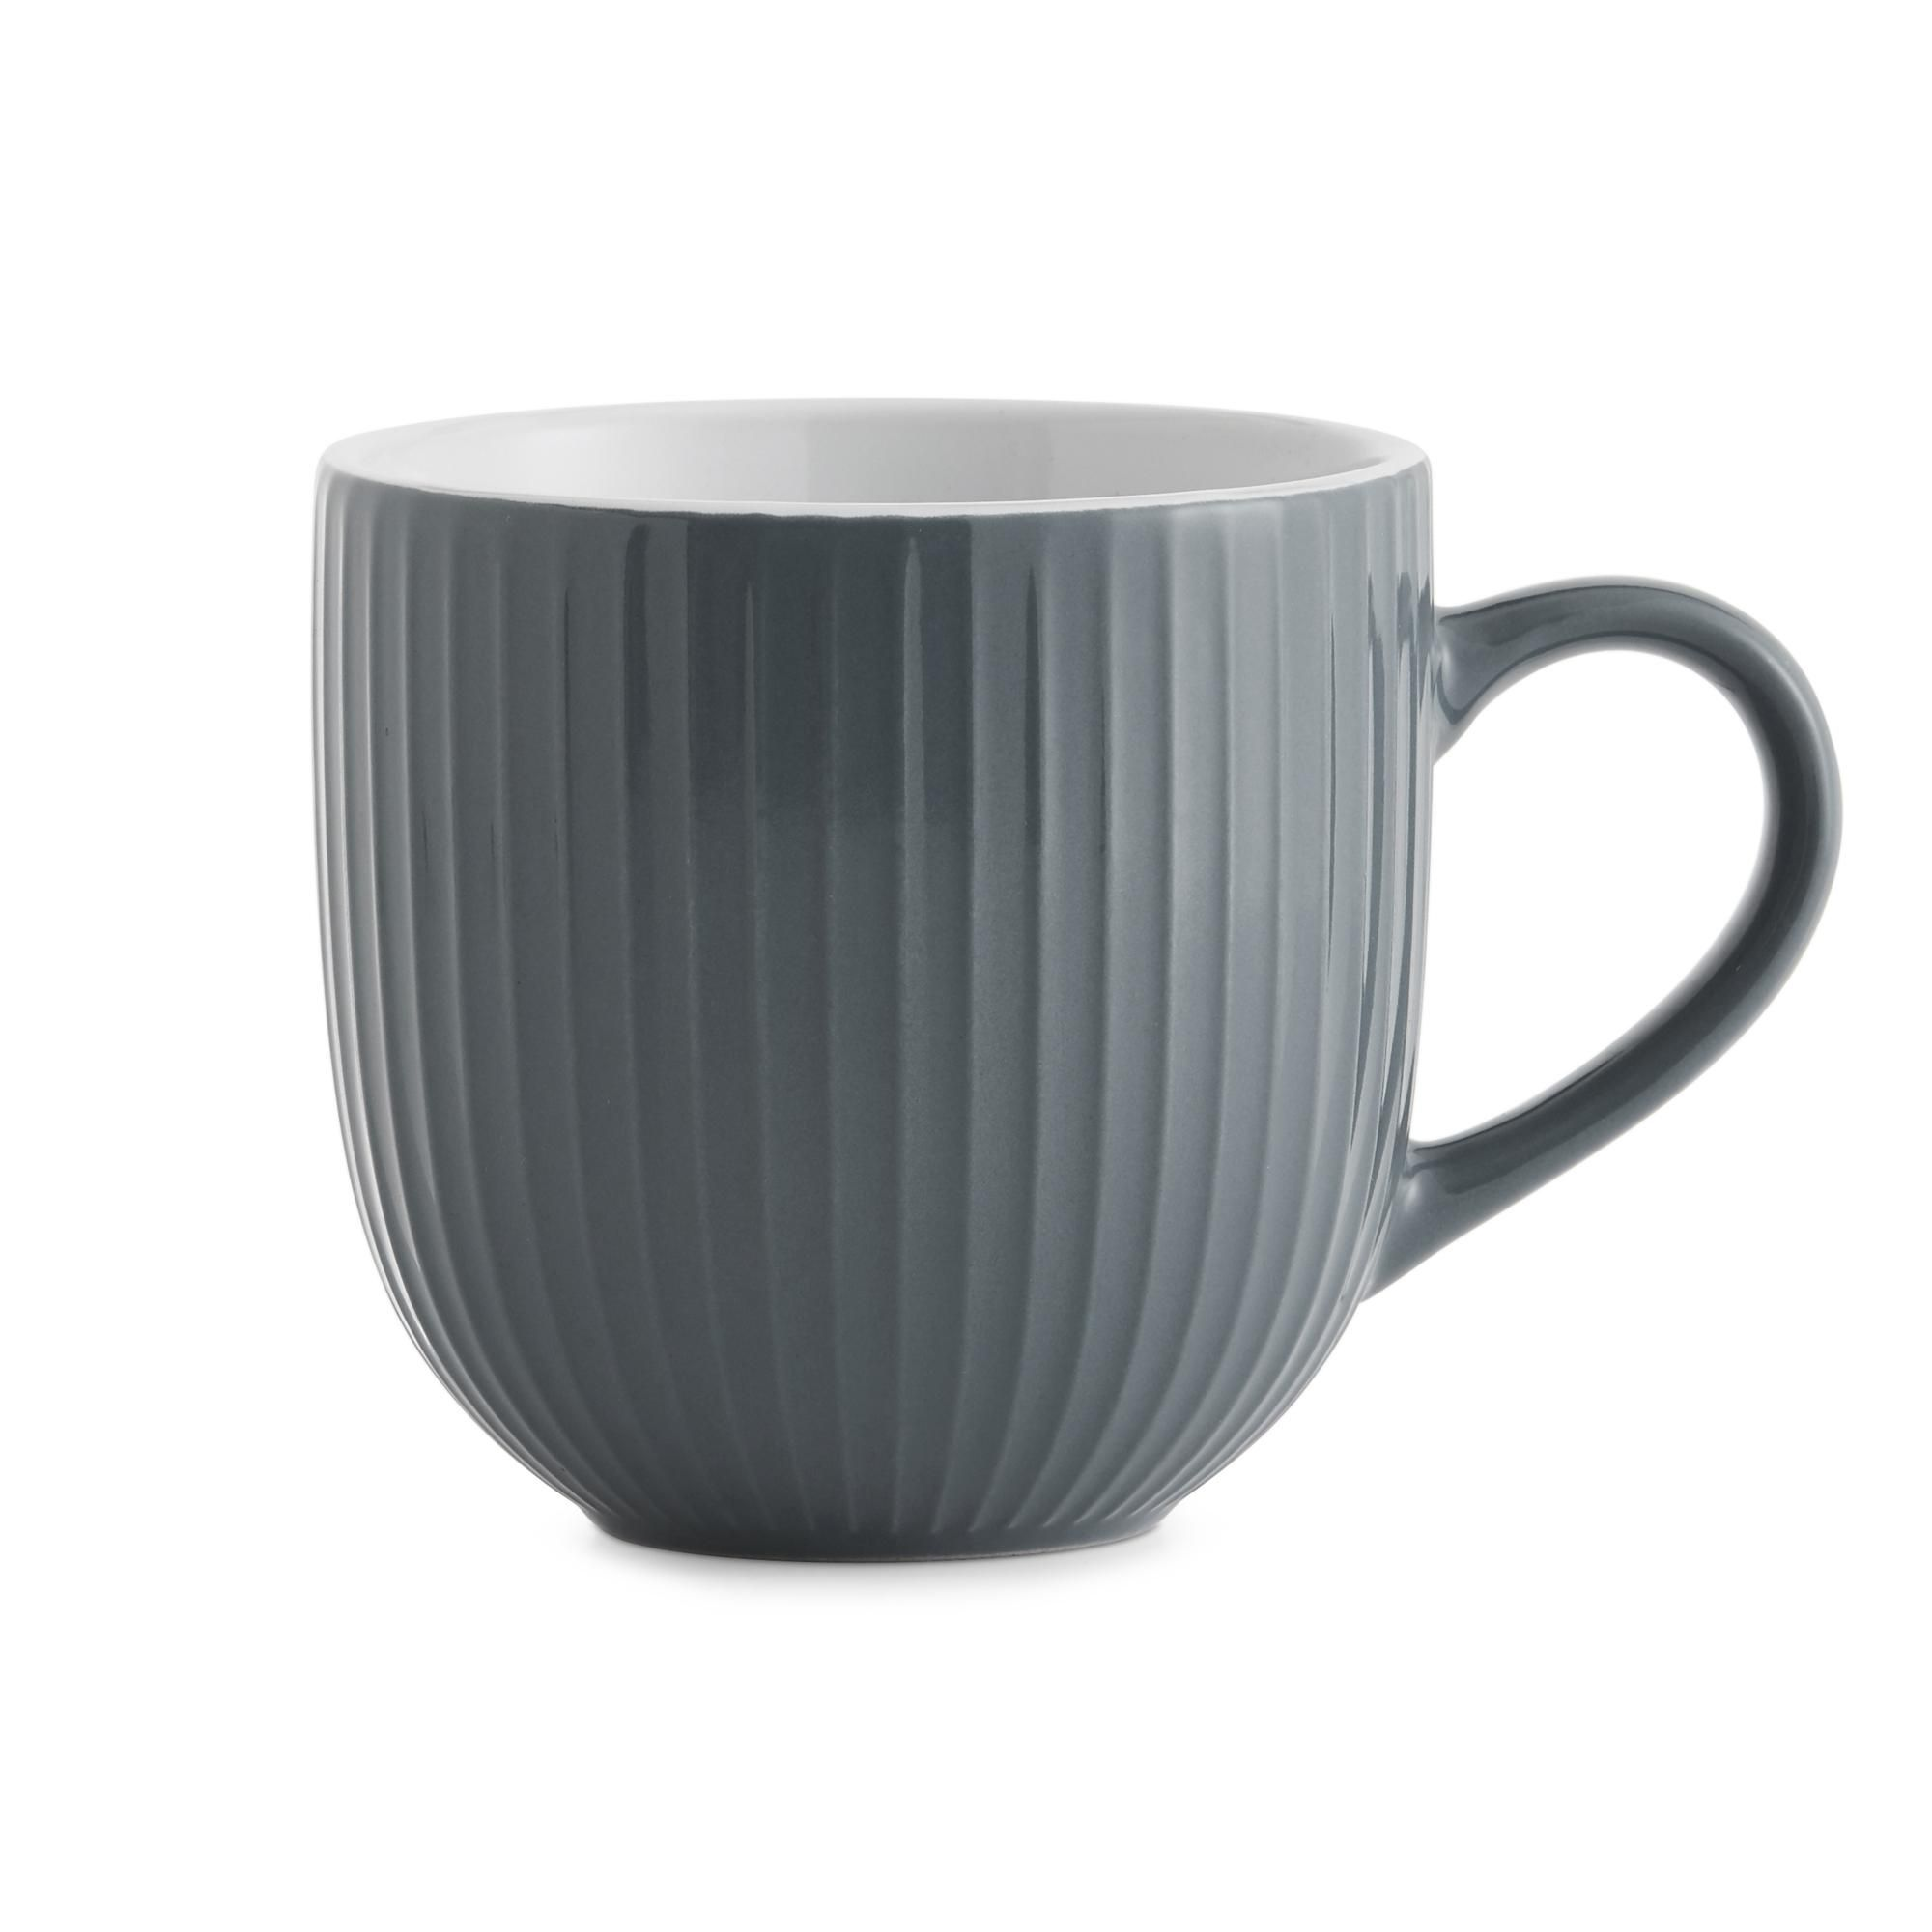 Lyon Airforce Blue Mug Mugs Teal Mugs Tea Cups